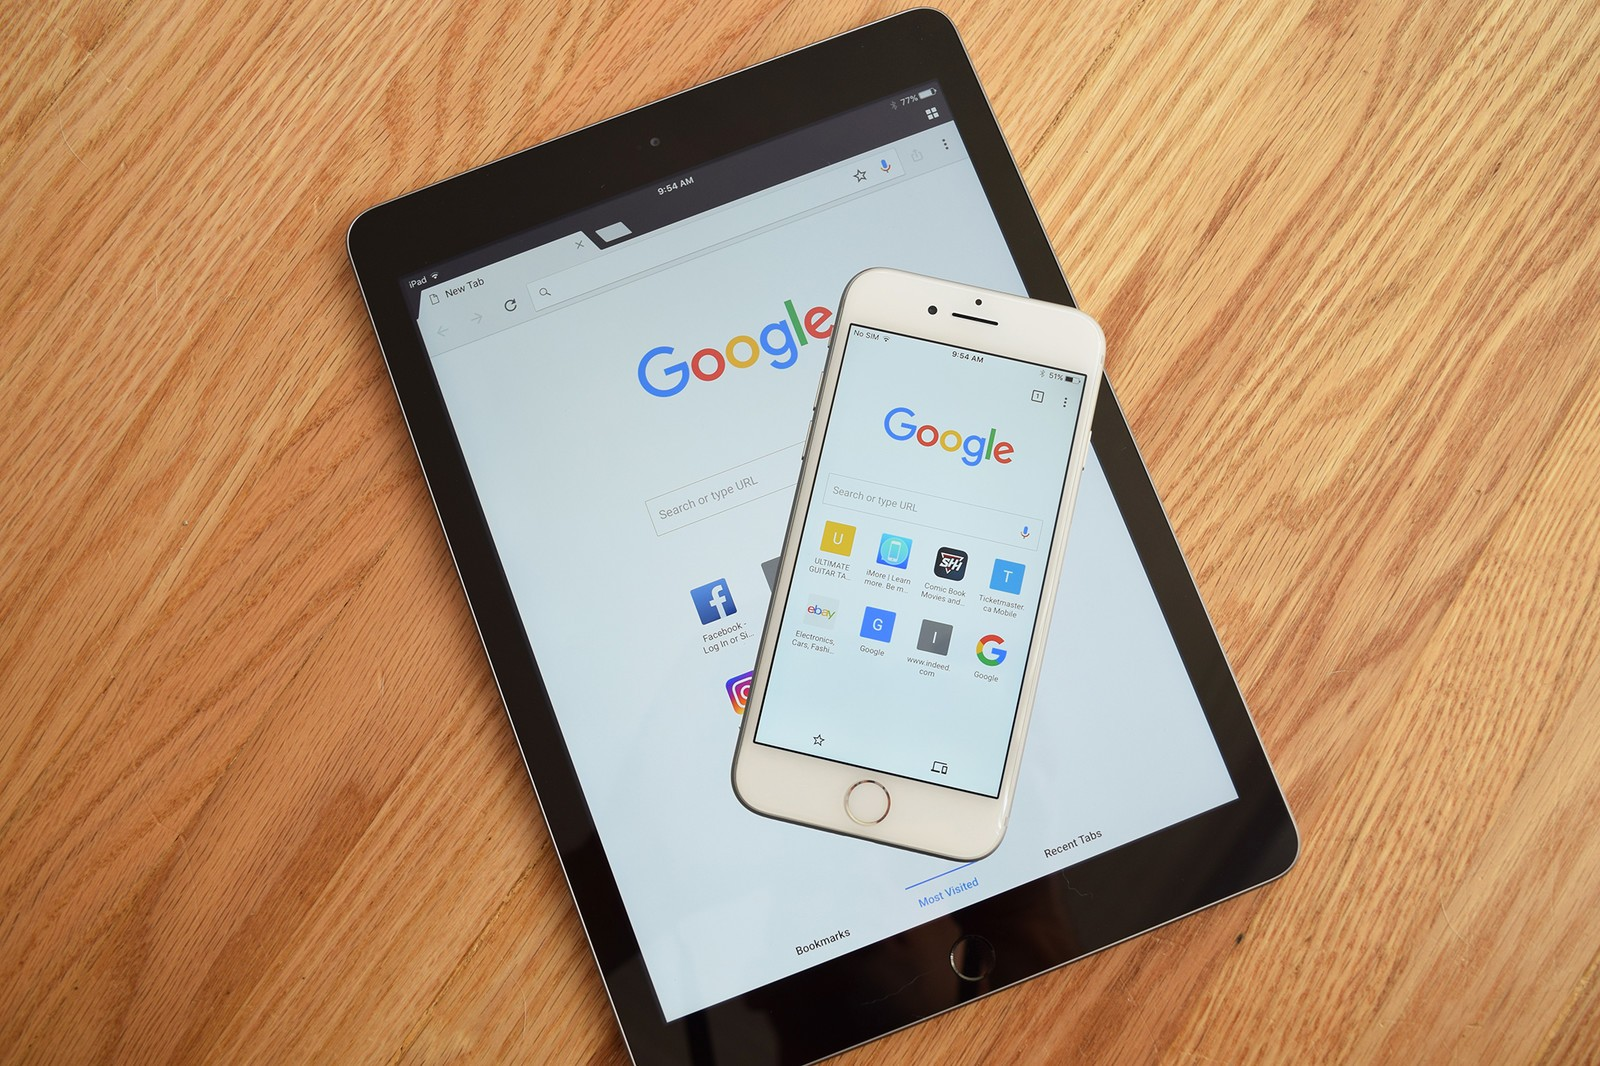 google-chrome-iphone-ipad-hero